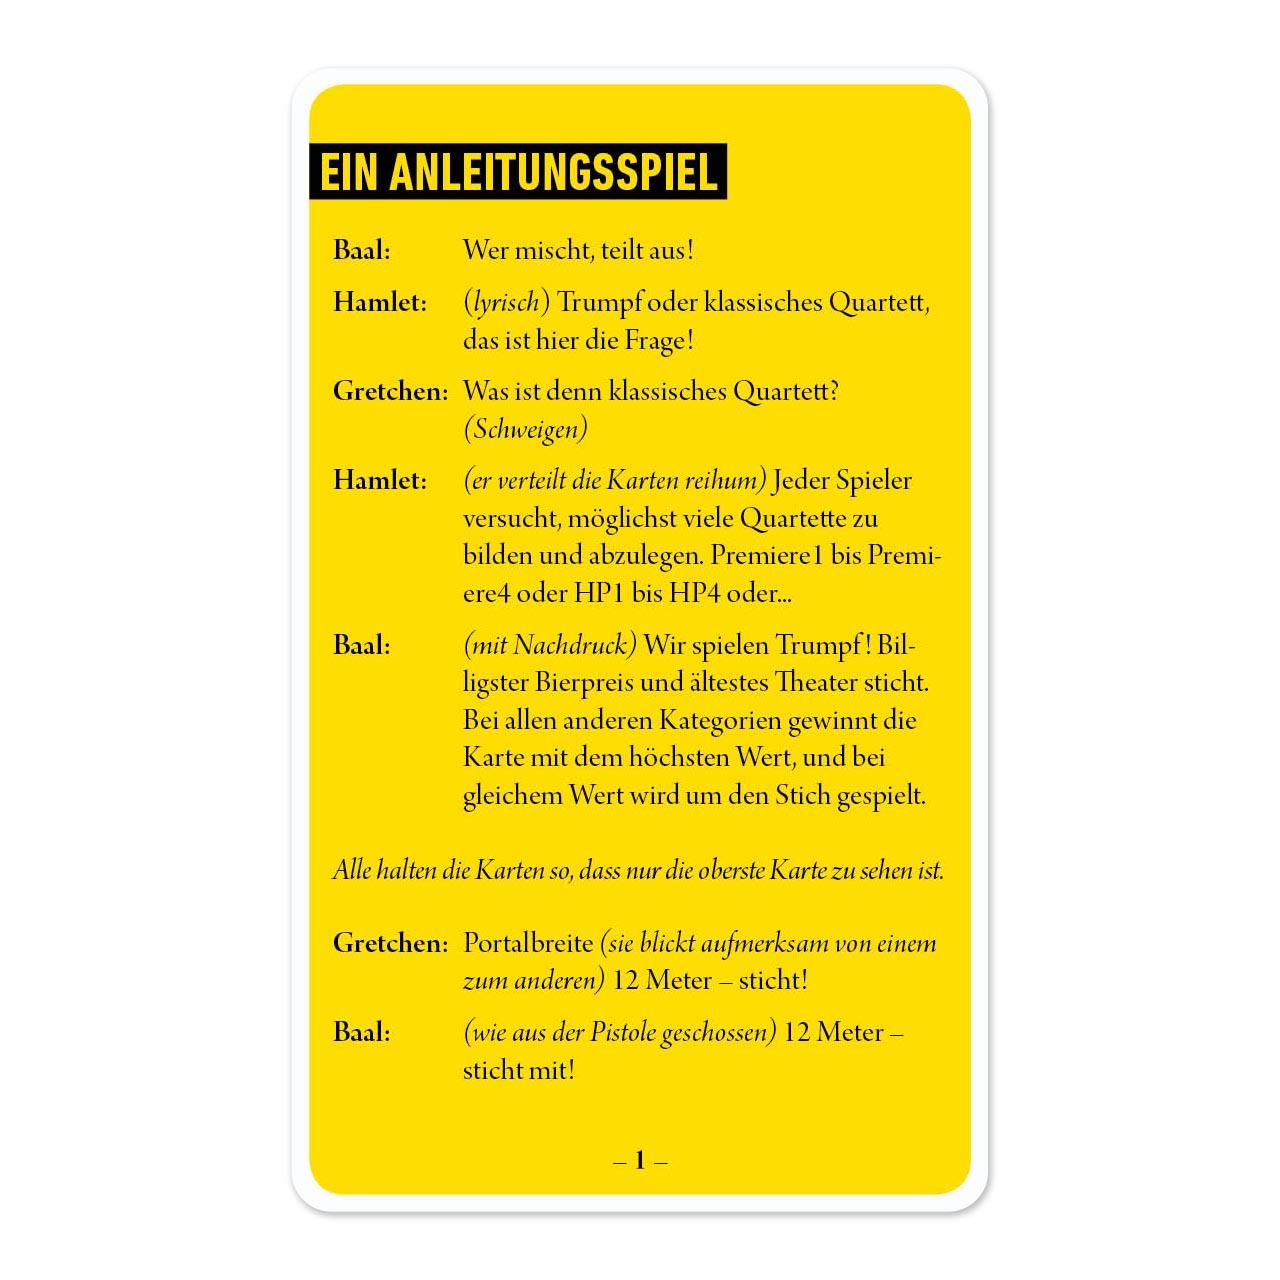 Theaterquartett, Anleitungsspiel 1